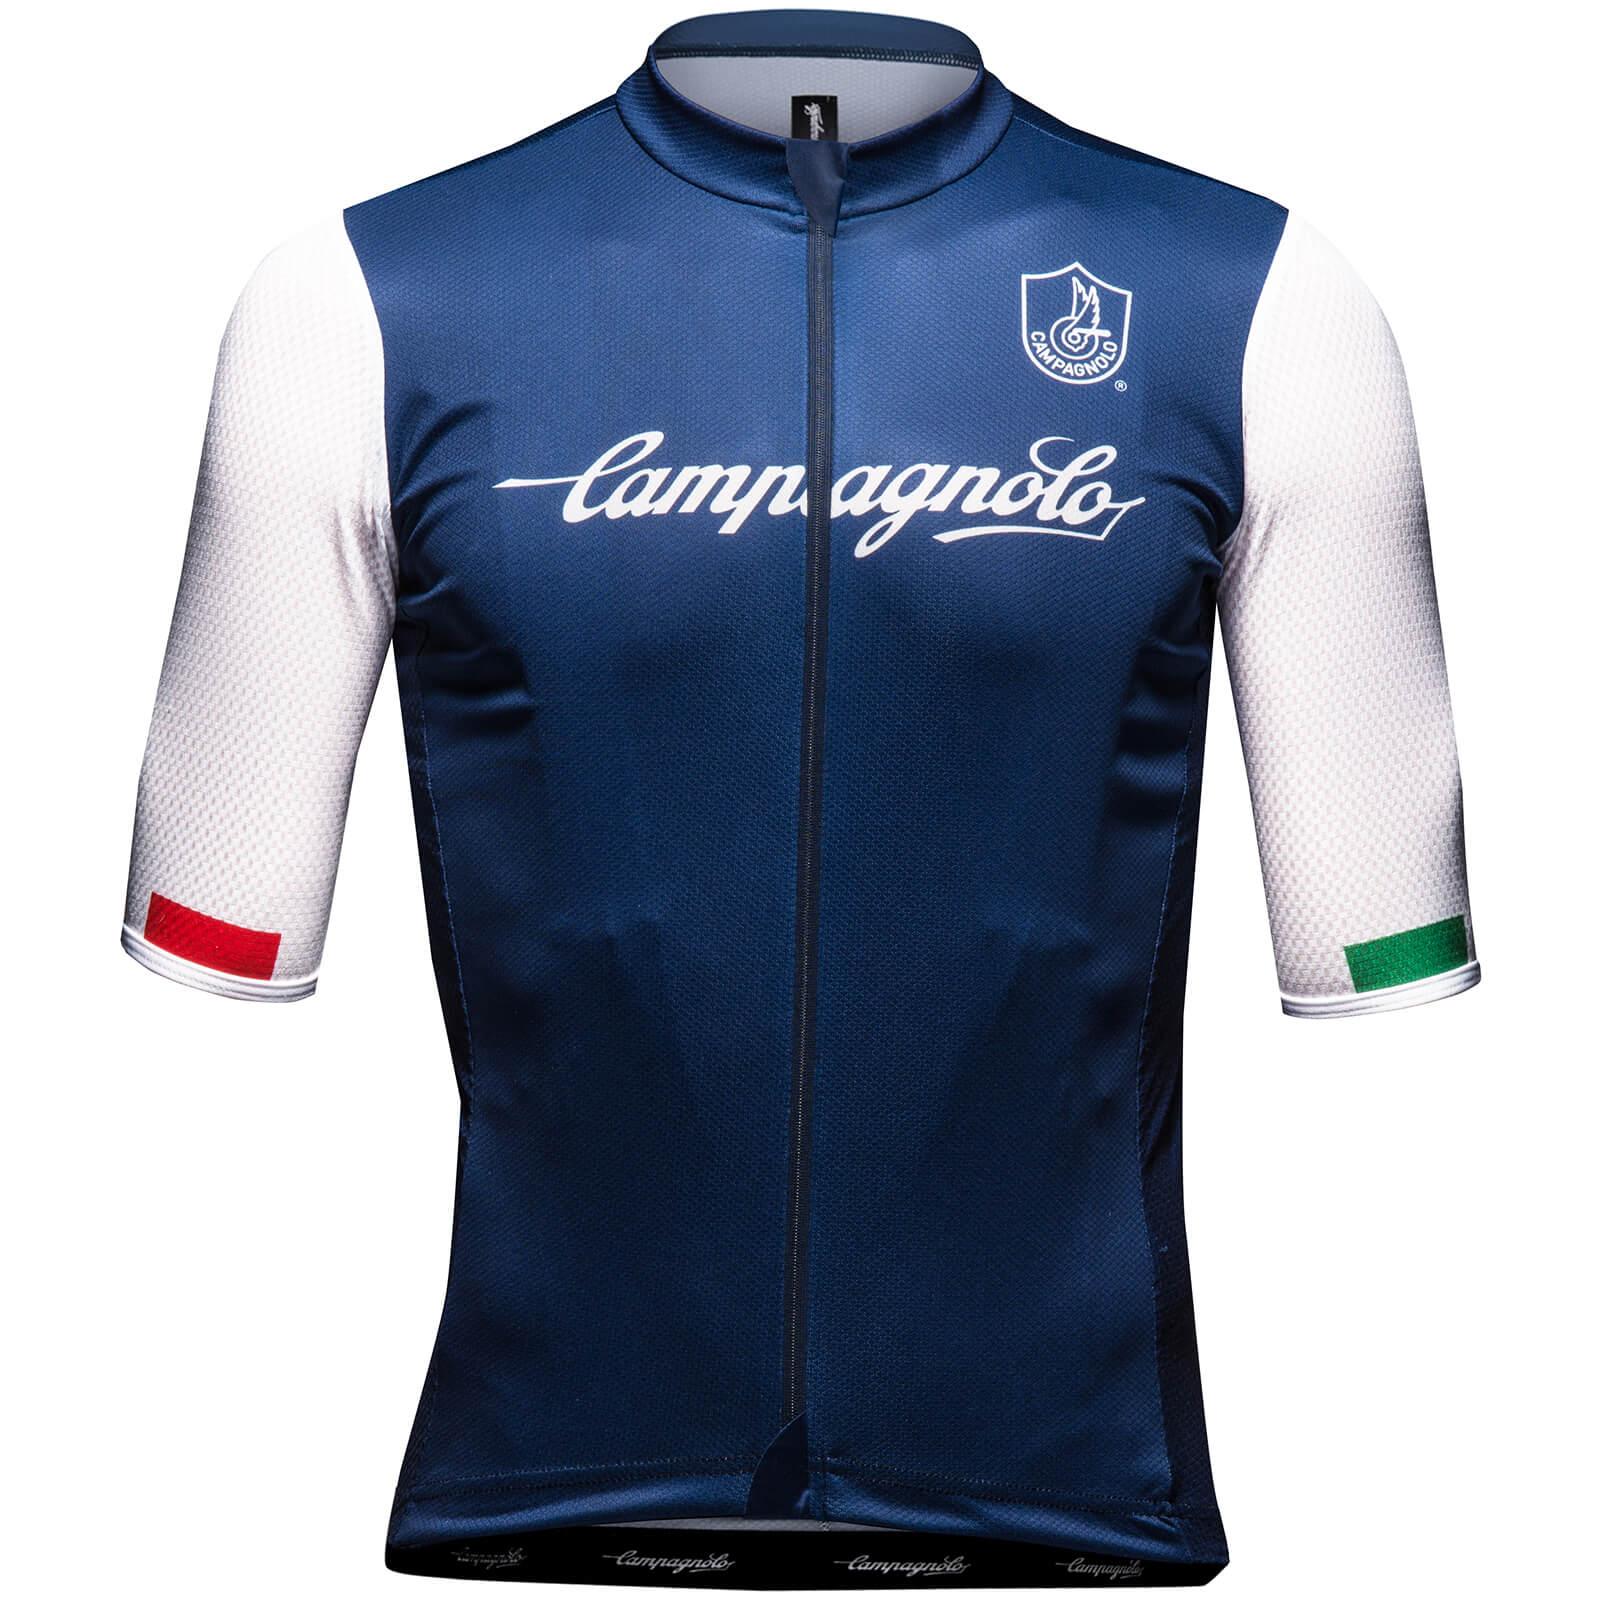 Nalini Campagnolo Iridio Jersey - L - Blue/White